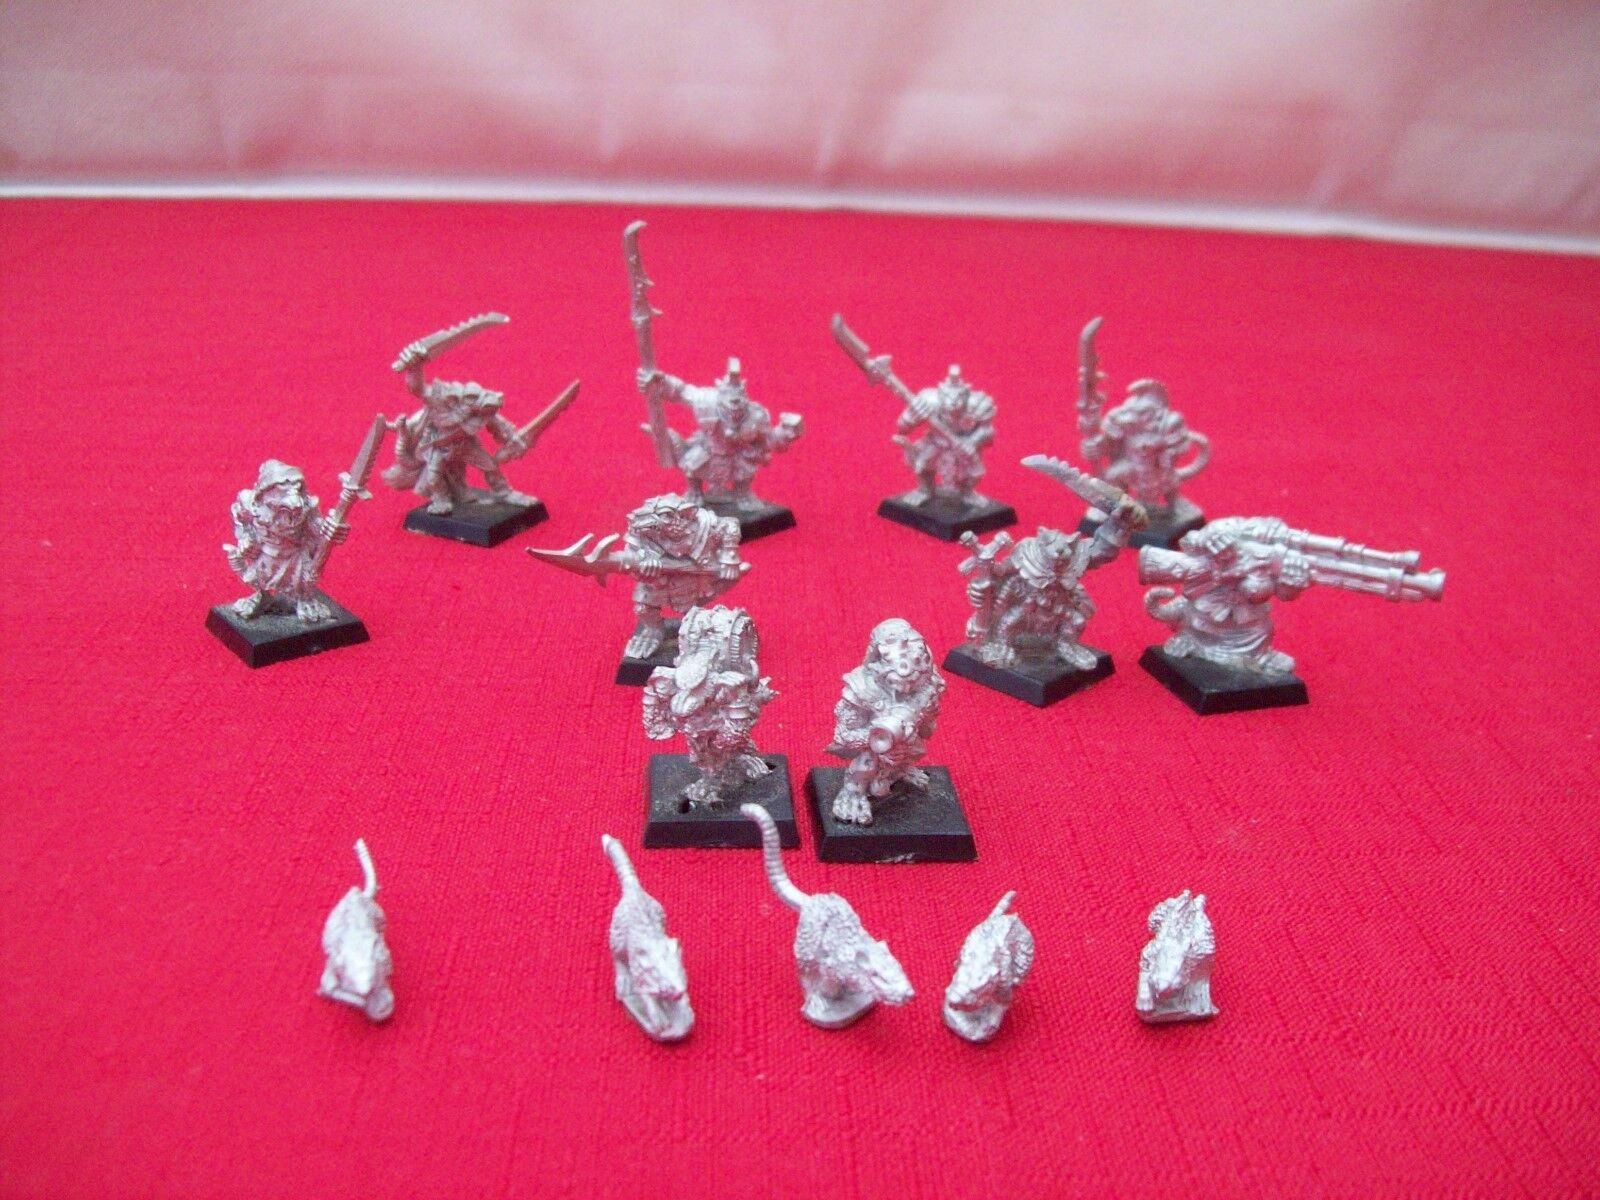 Warhammer Fantasy SKAVEN ARMY-Métal-non peinte peinte peinte 7cf5ff